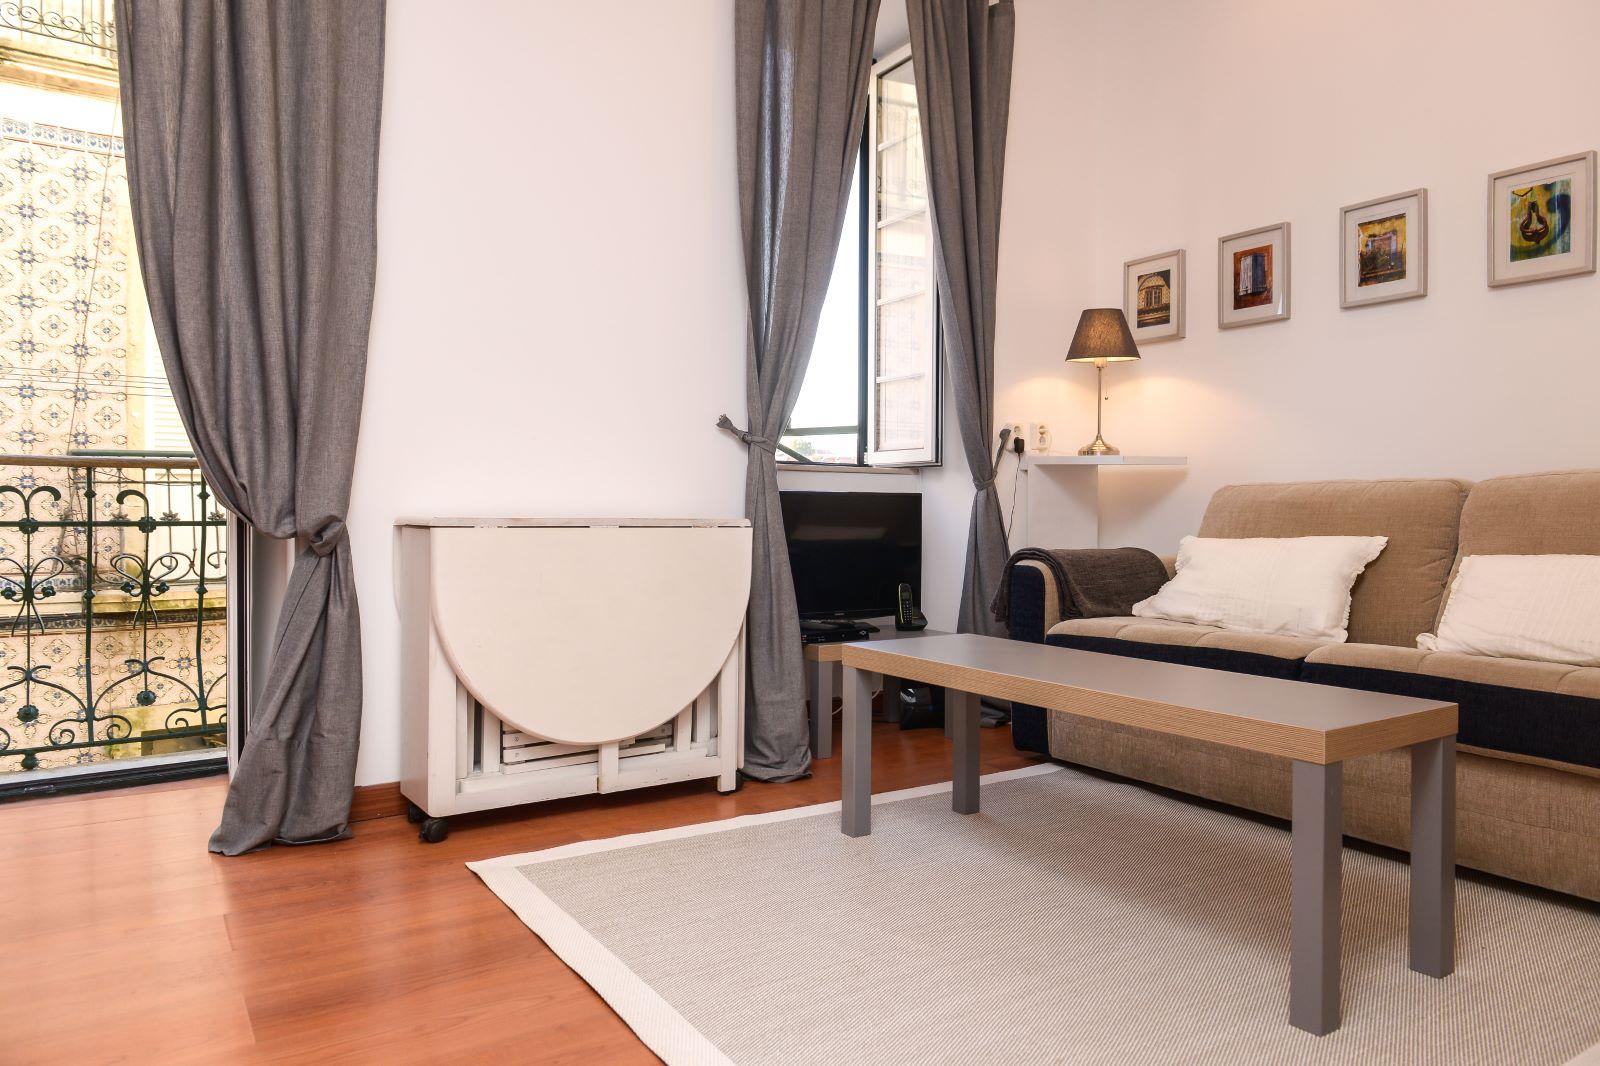 1 BEDROOM APARTMENT TOTALLY REFURBISHED IN GRAÇA, LISBON